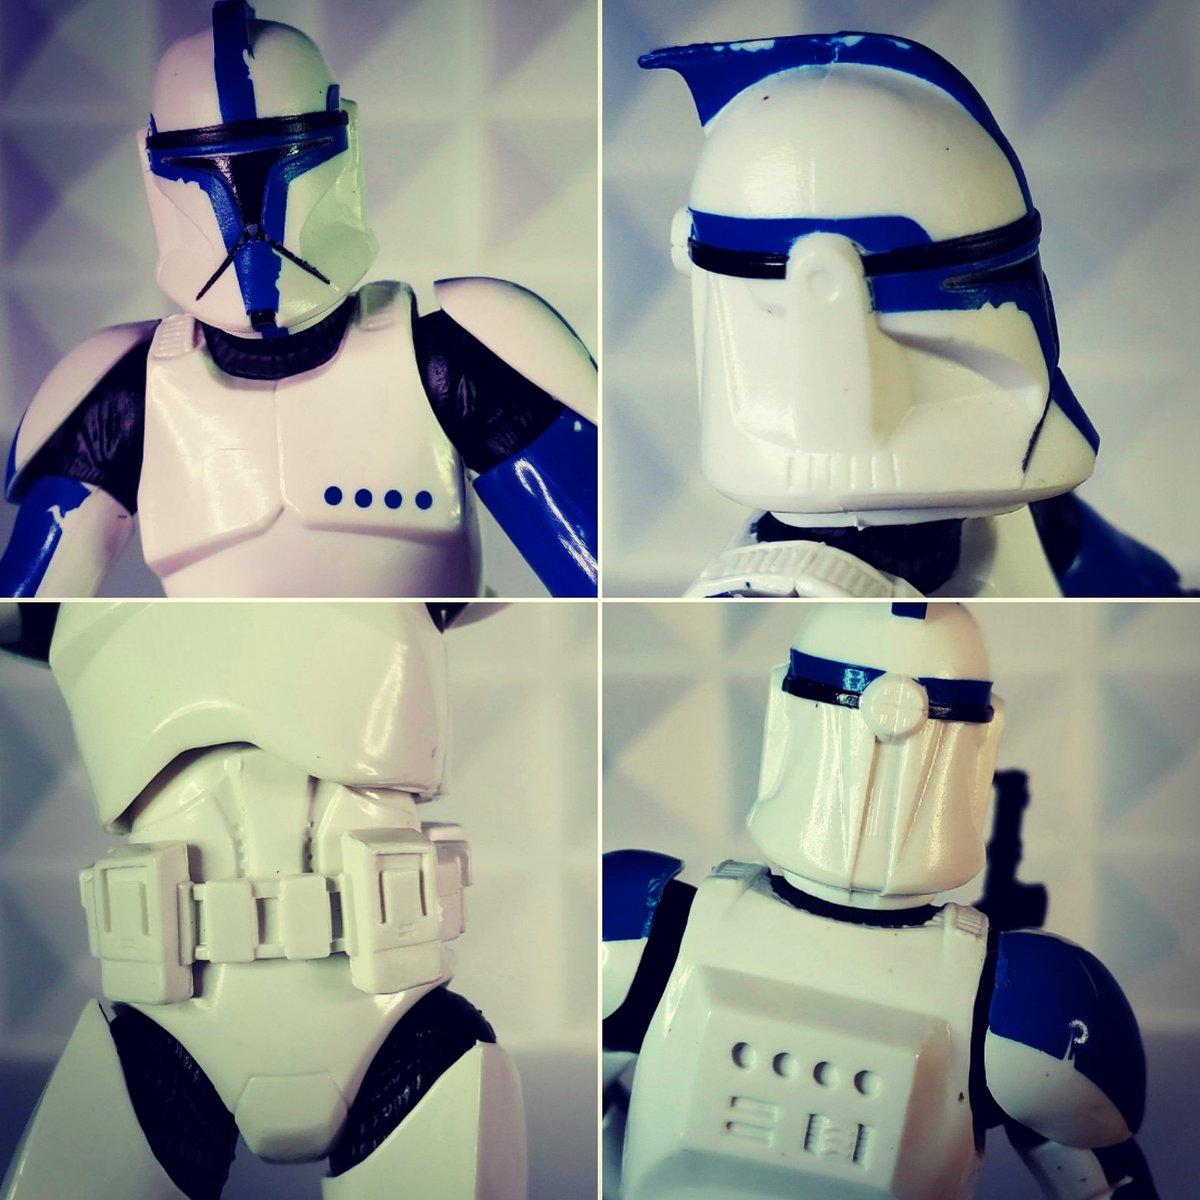 Clone Trooper Lt 🤘🤘 #starwars #blackseries #actionfigures #toyphtography #clonewars #attackoftheclones https://t.co/Hi8L5Eb0kg